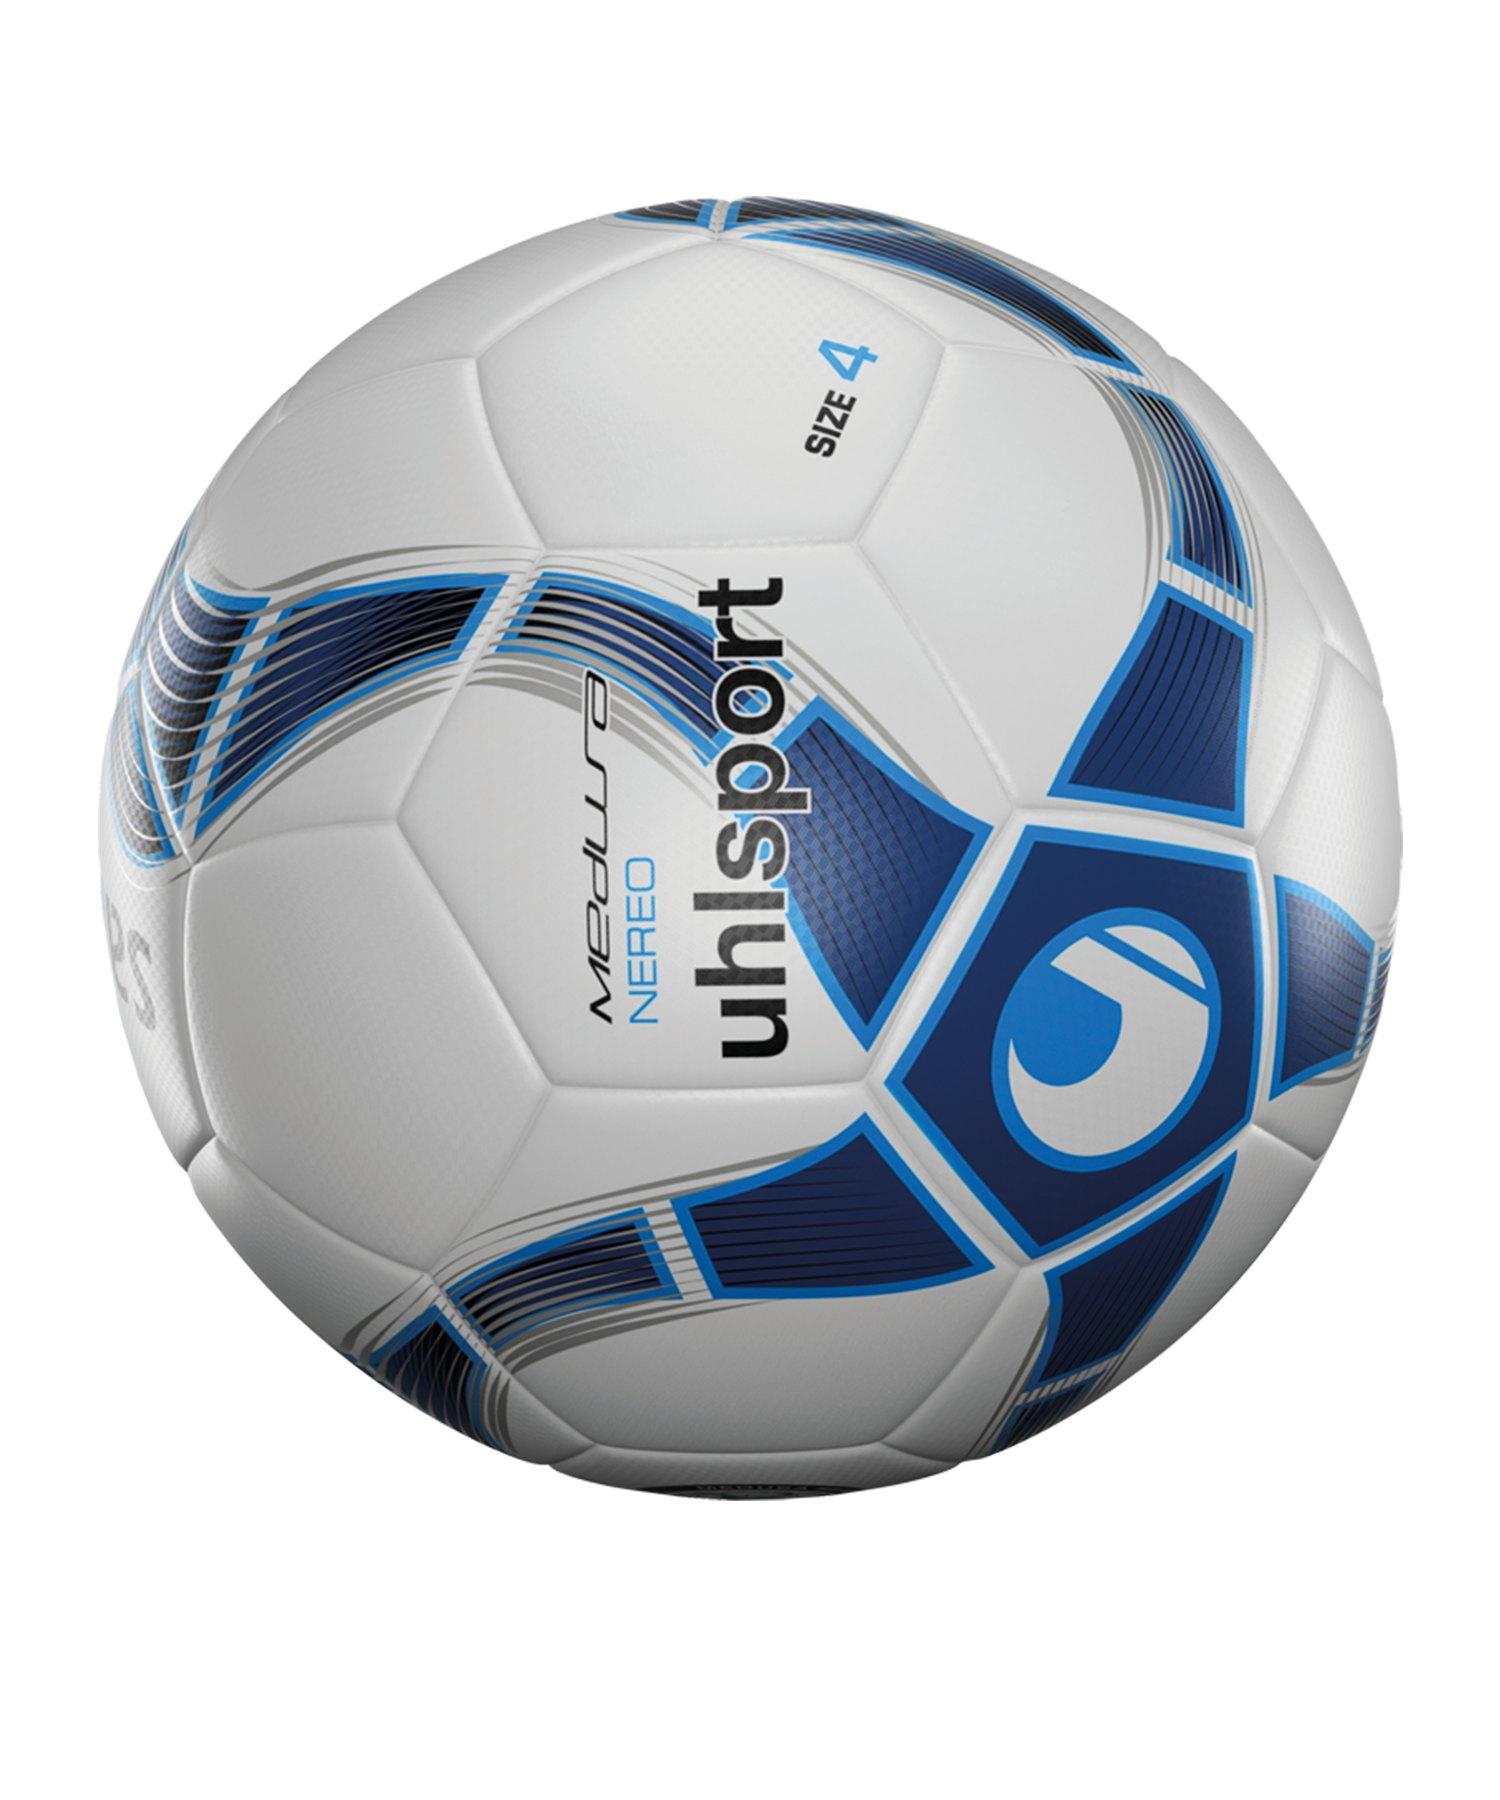 Uhlsport Medusa Nereo Trainingsball Weiss F02 - weiss